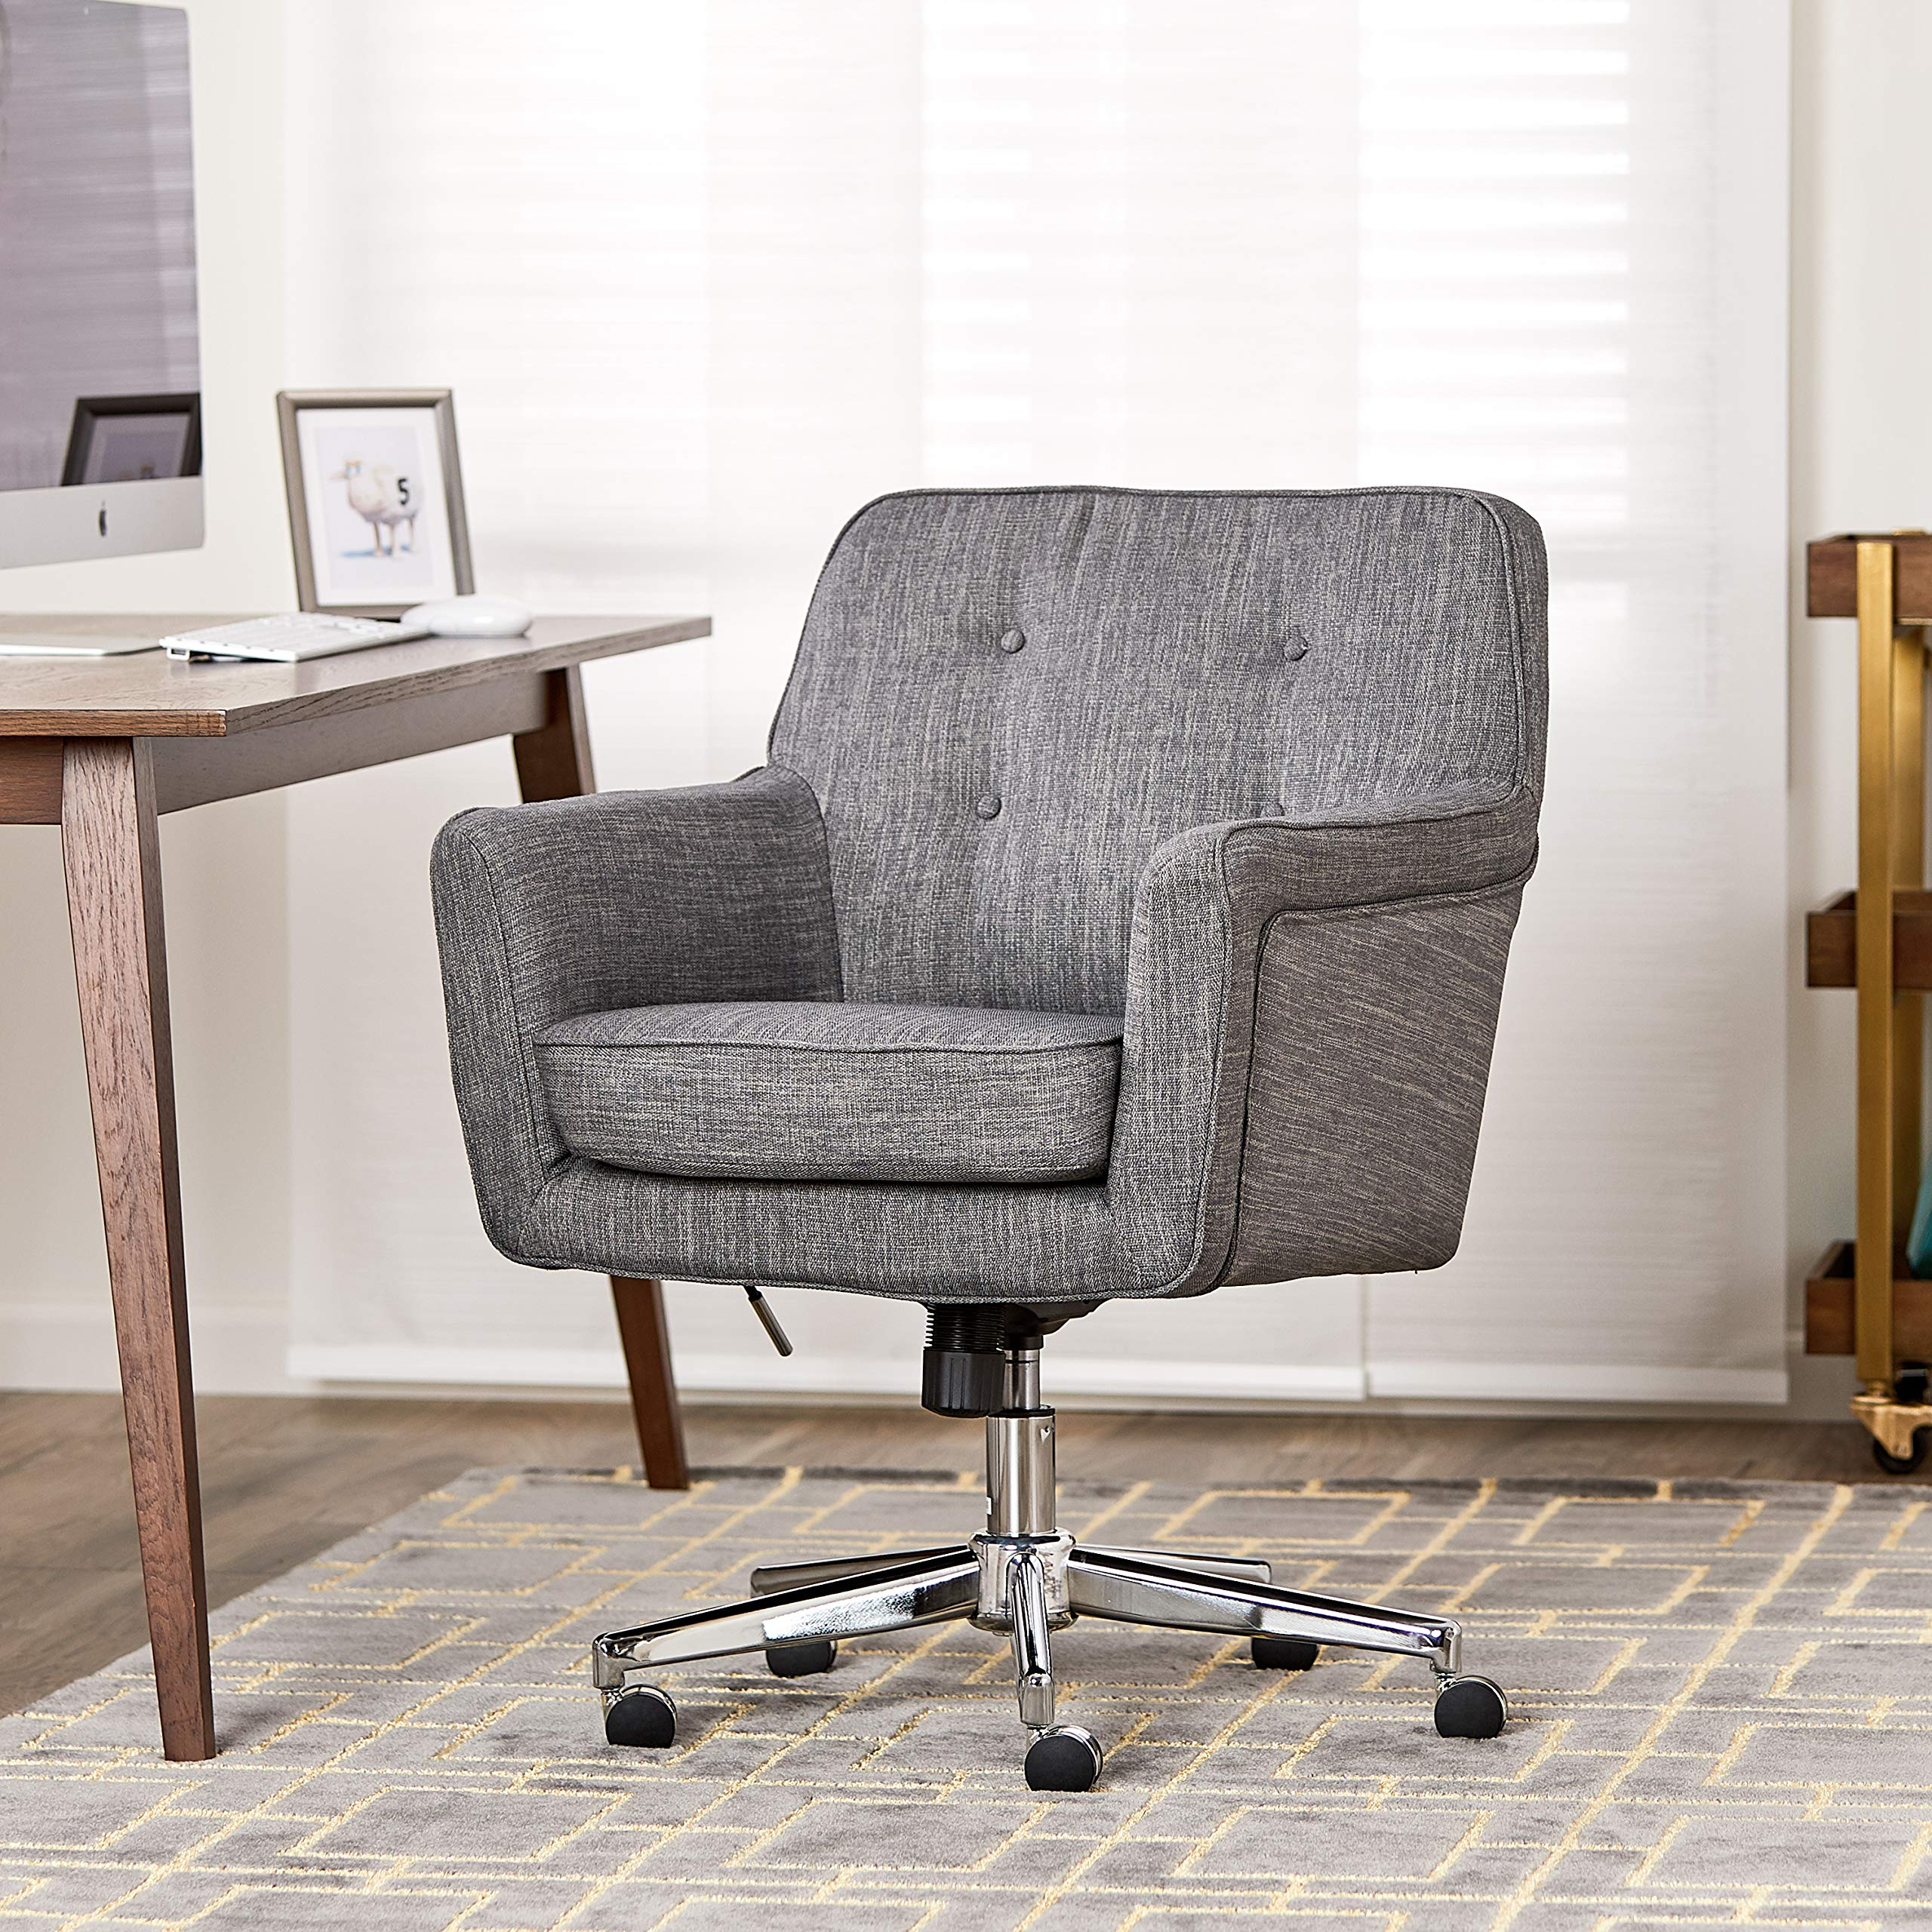 Serta Style Ashland Home Office Chair, Twill Fabric, Gray by Serta